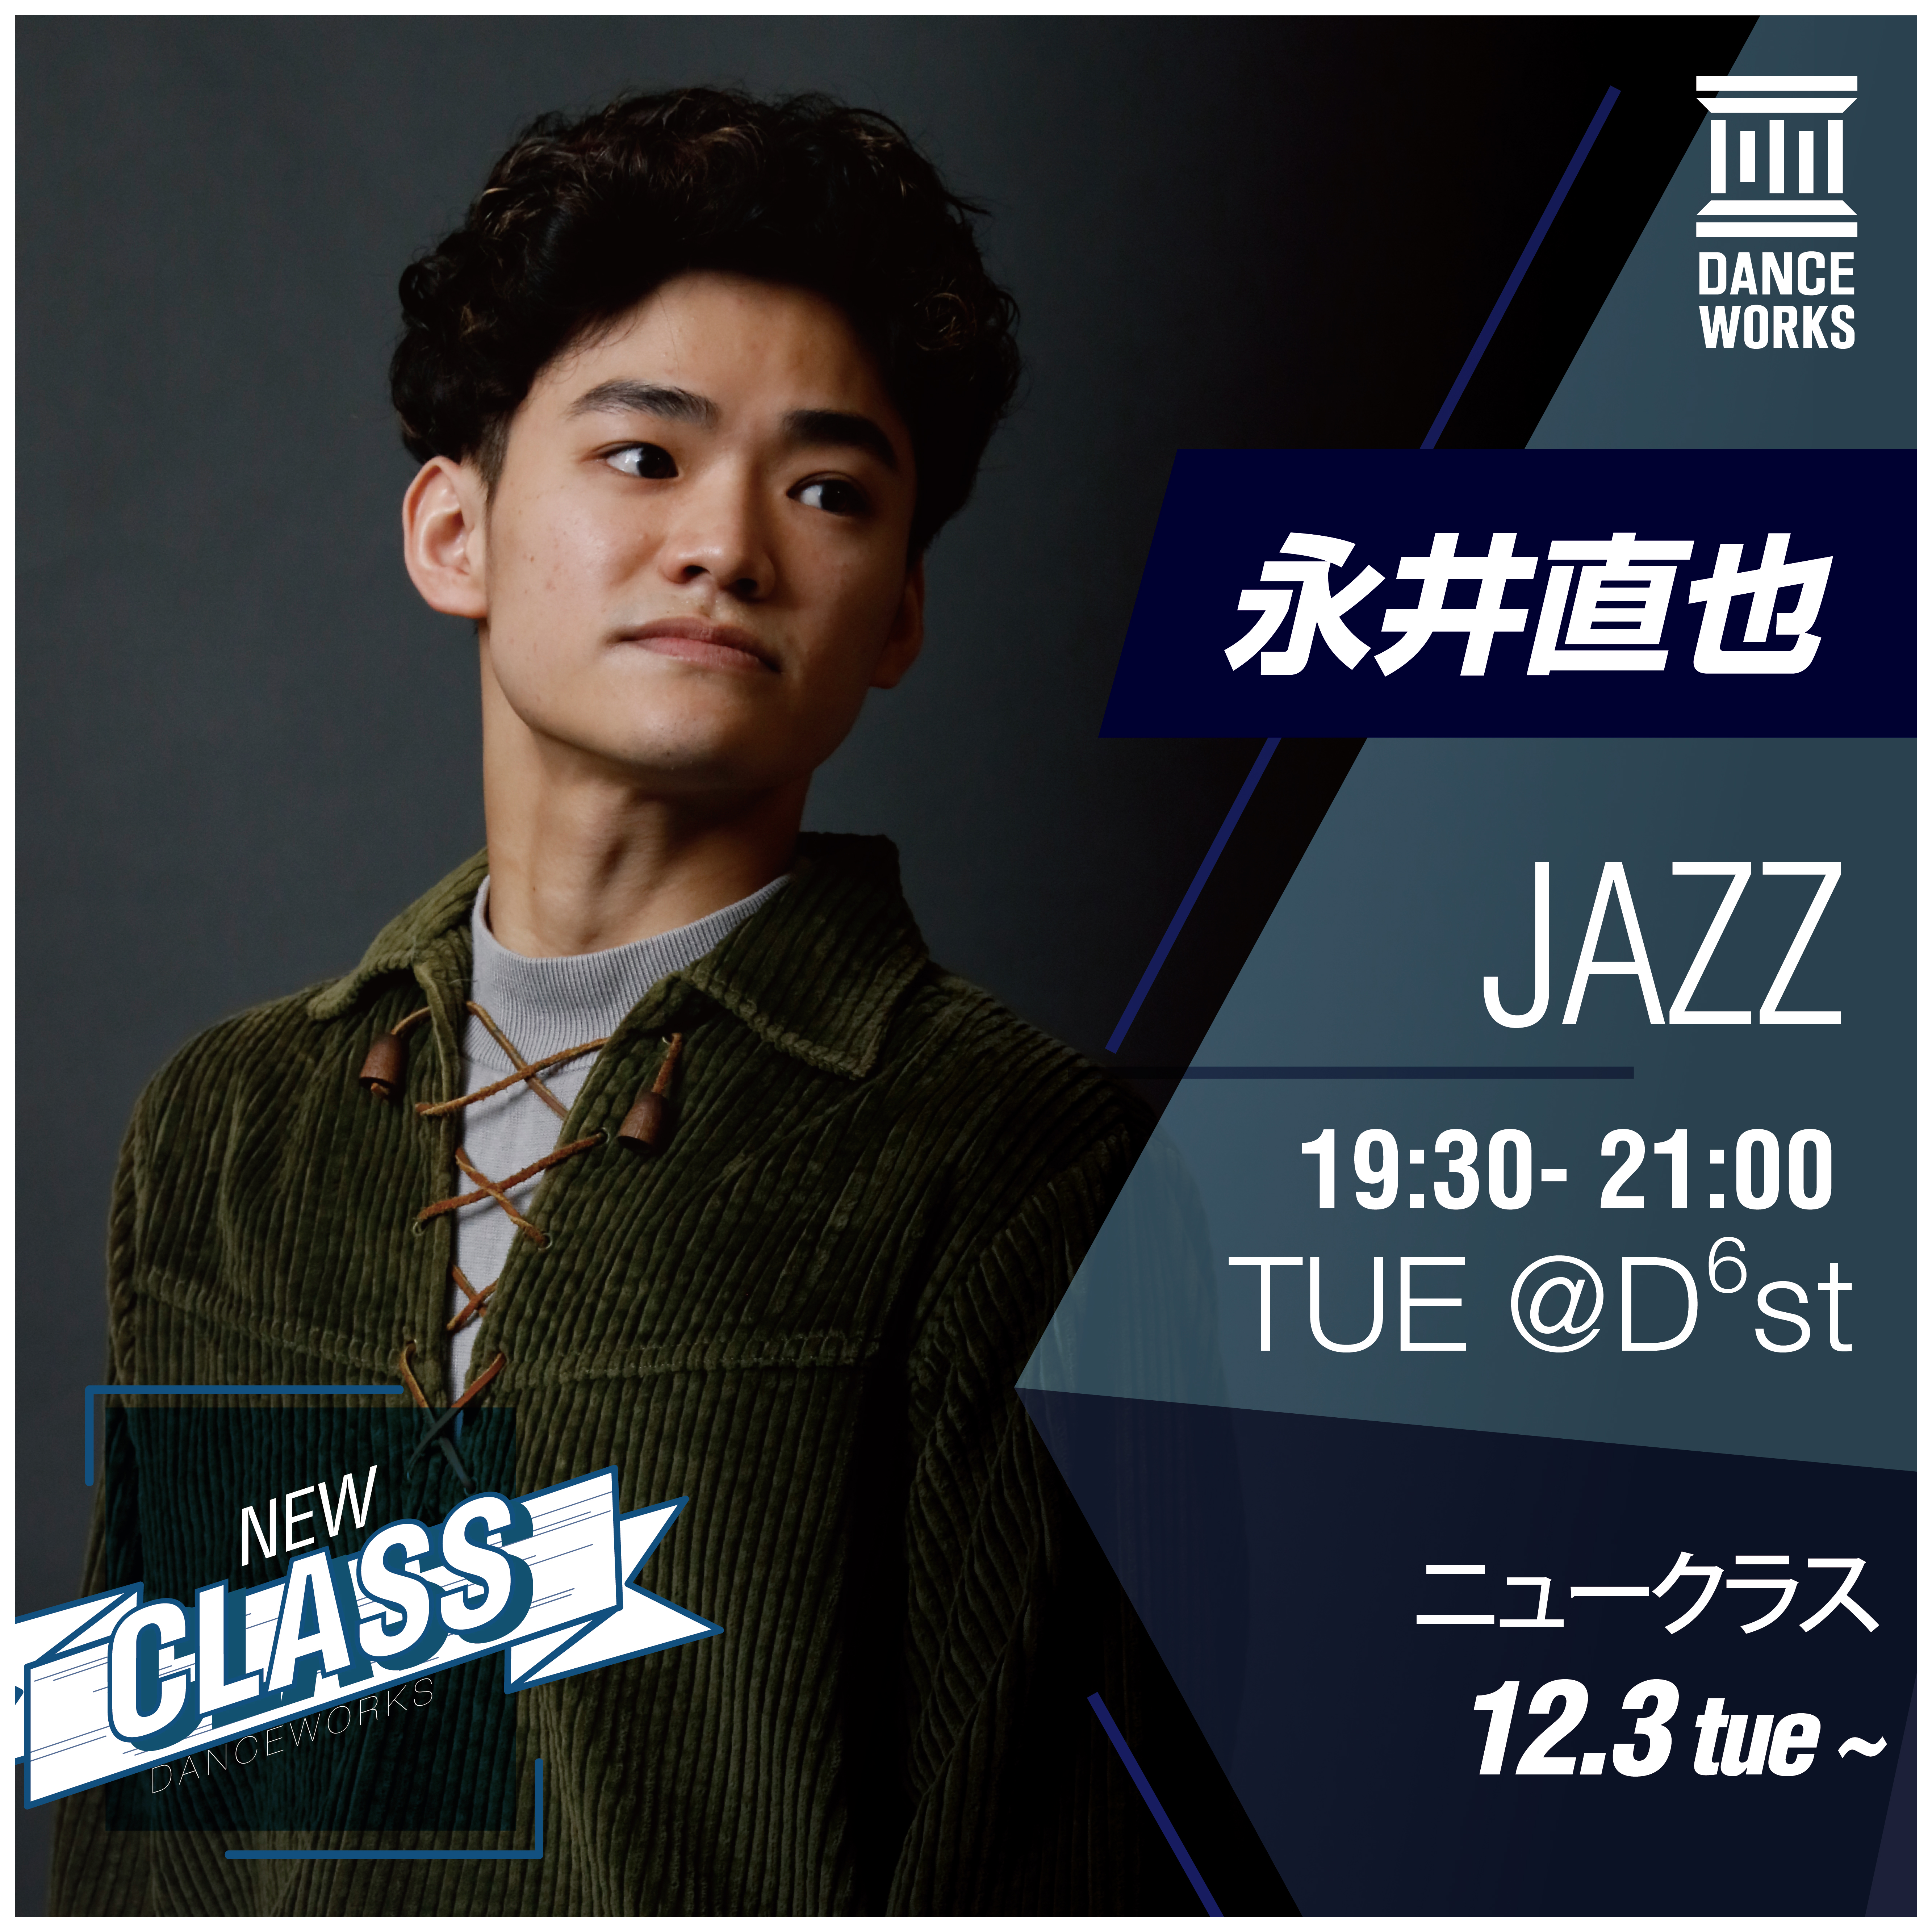 Dance Works、永井直也氏のJAZZニュークラスが遂にスタート!